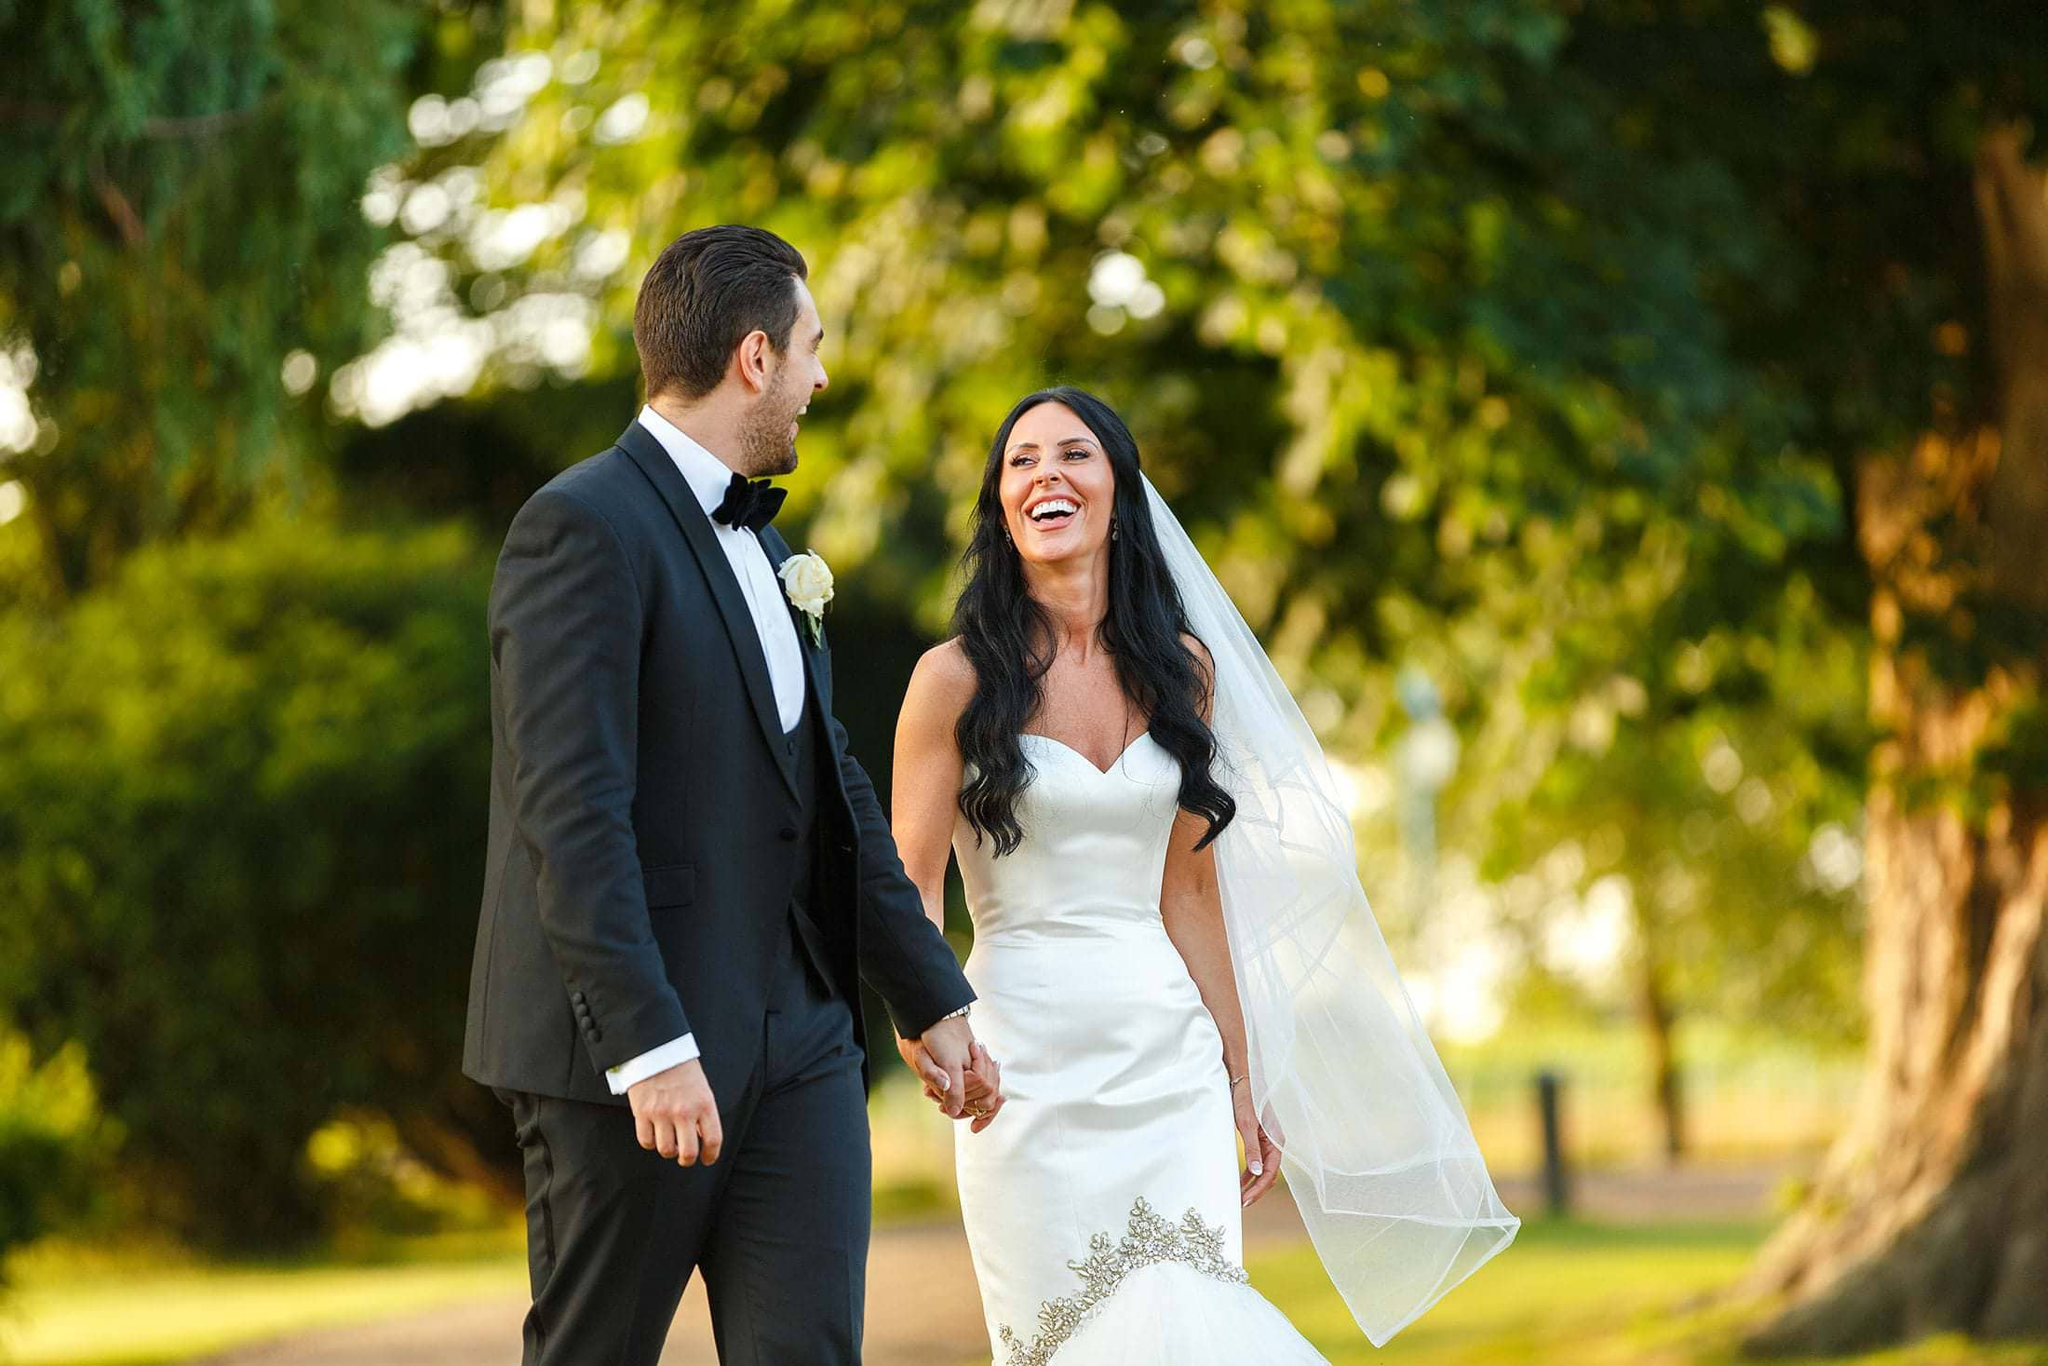 Sarah & Elliot's Gosfield Wedding Hollywood Glamour